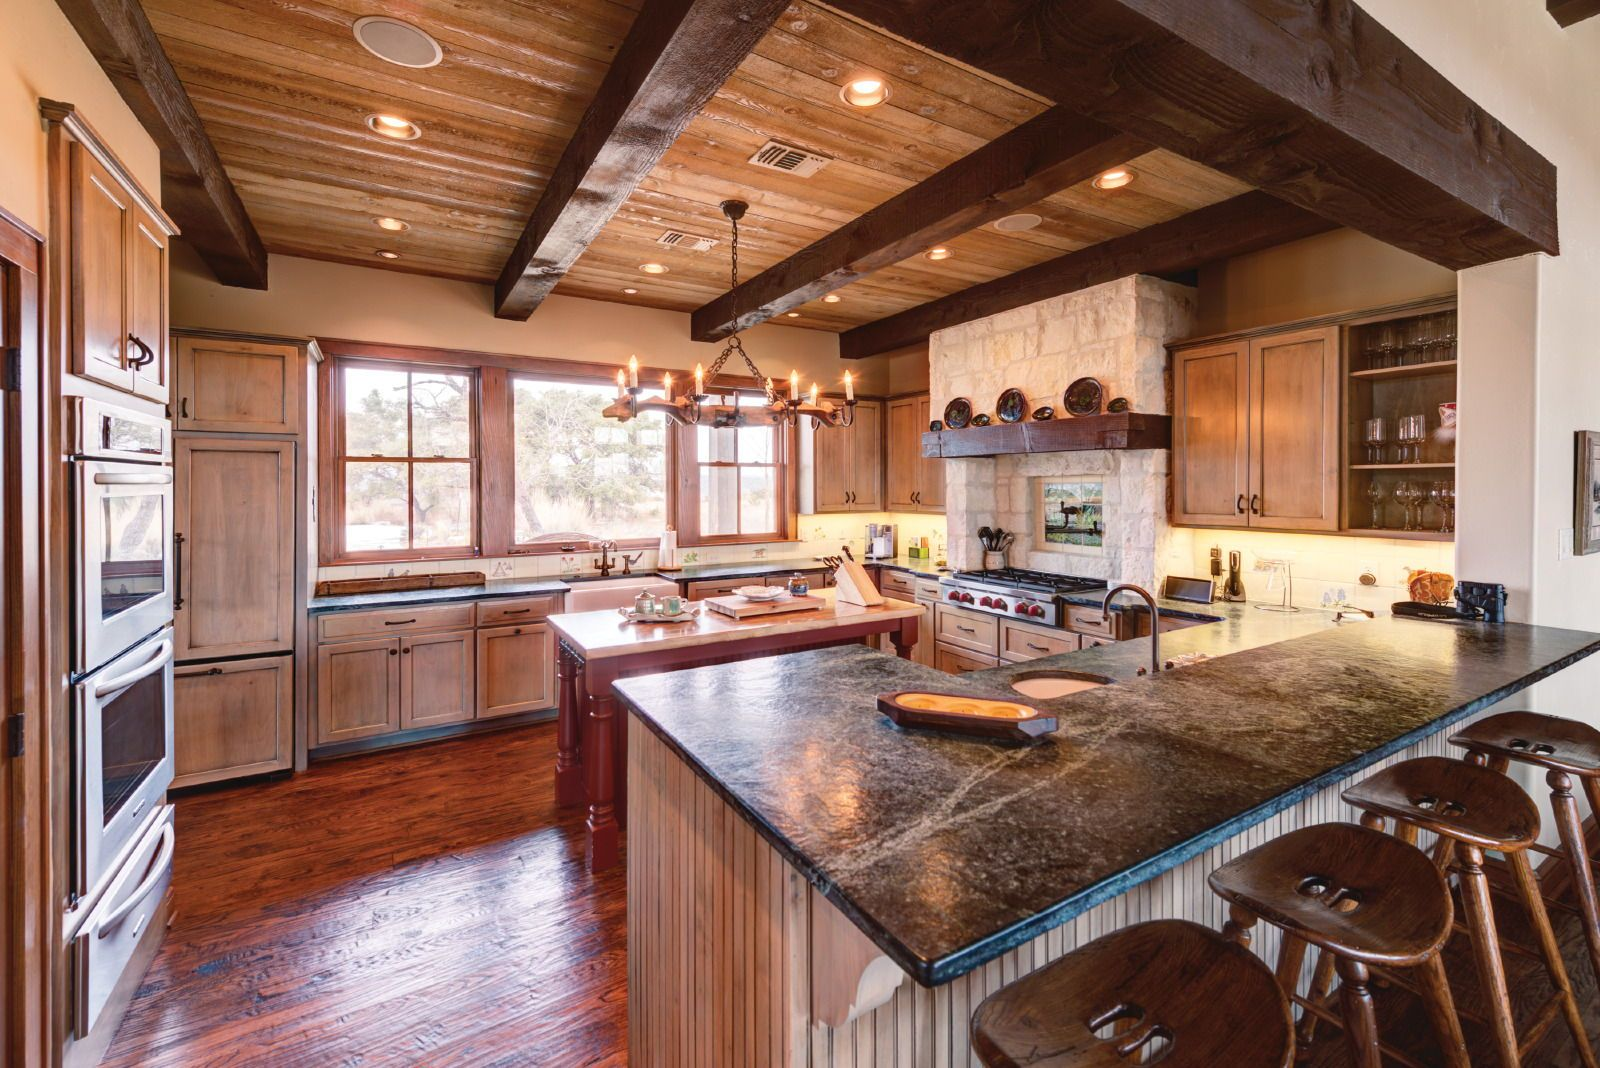 Dream kitchen ideas open concept interior design luxury homes inspiration home interiors also rh pinterest